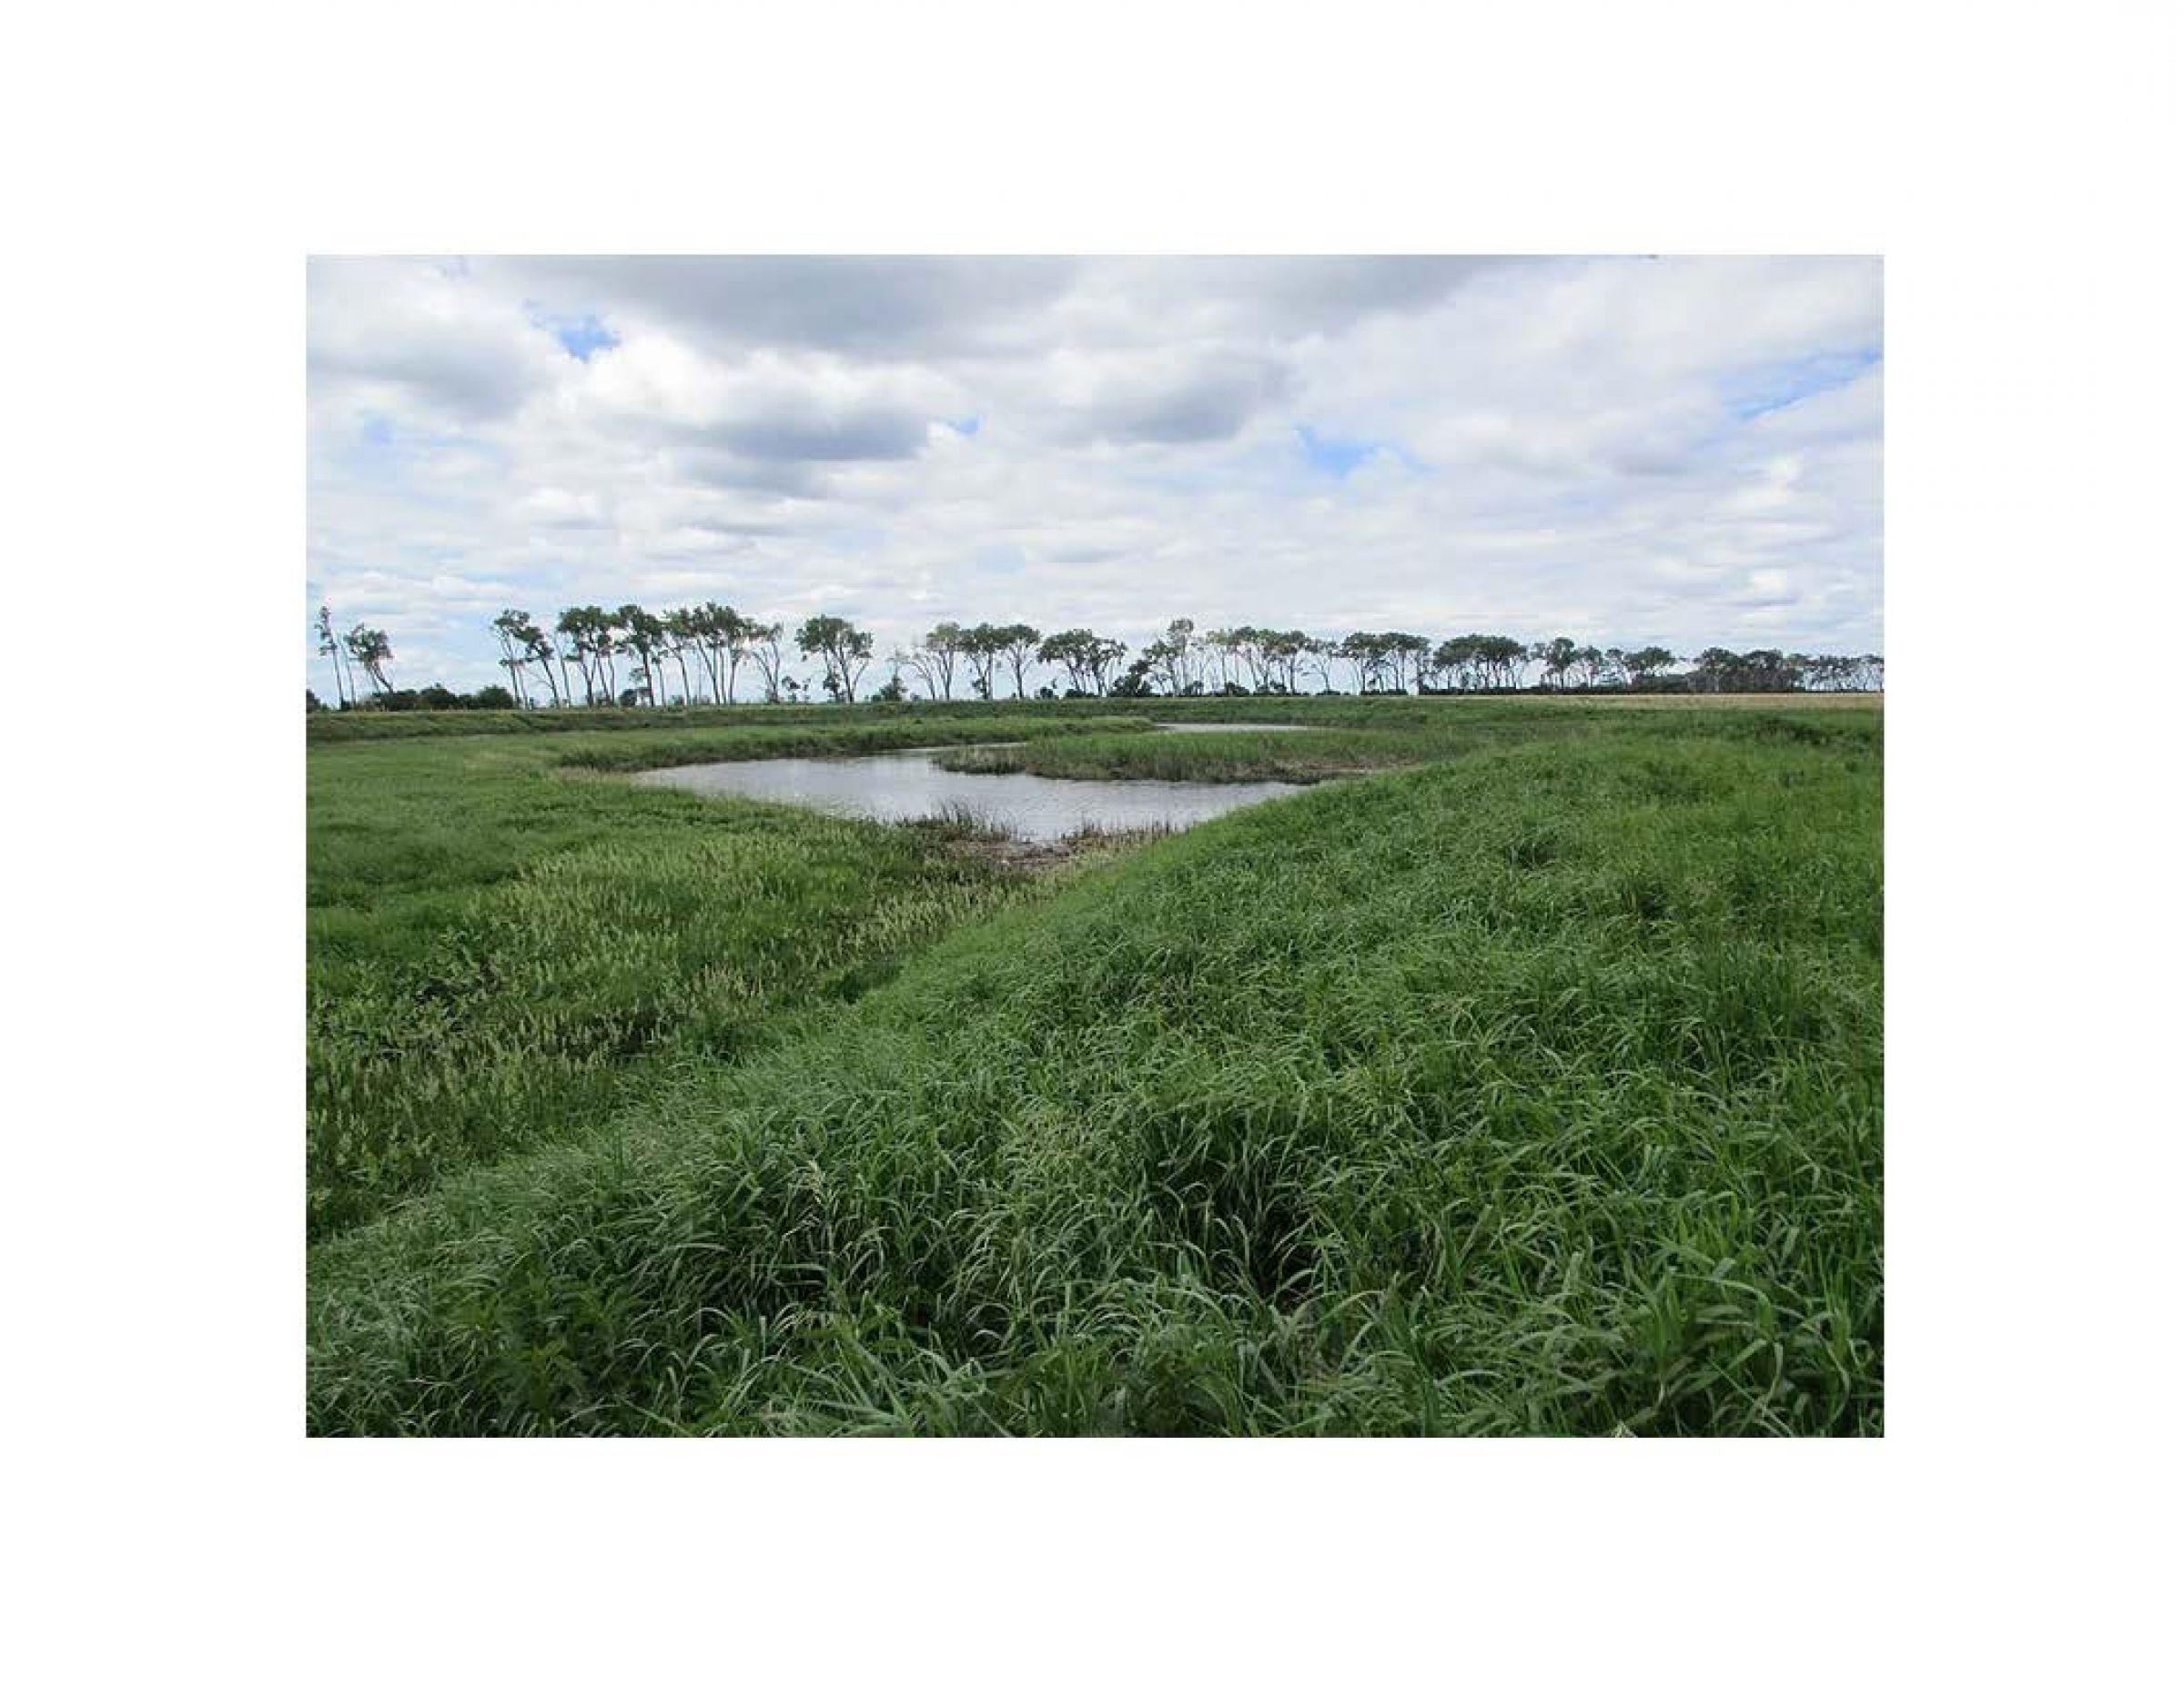 land-traill-county-north-dakota-25-acres-listing-number-15613-3-2021-06-24-191717.jpg